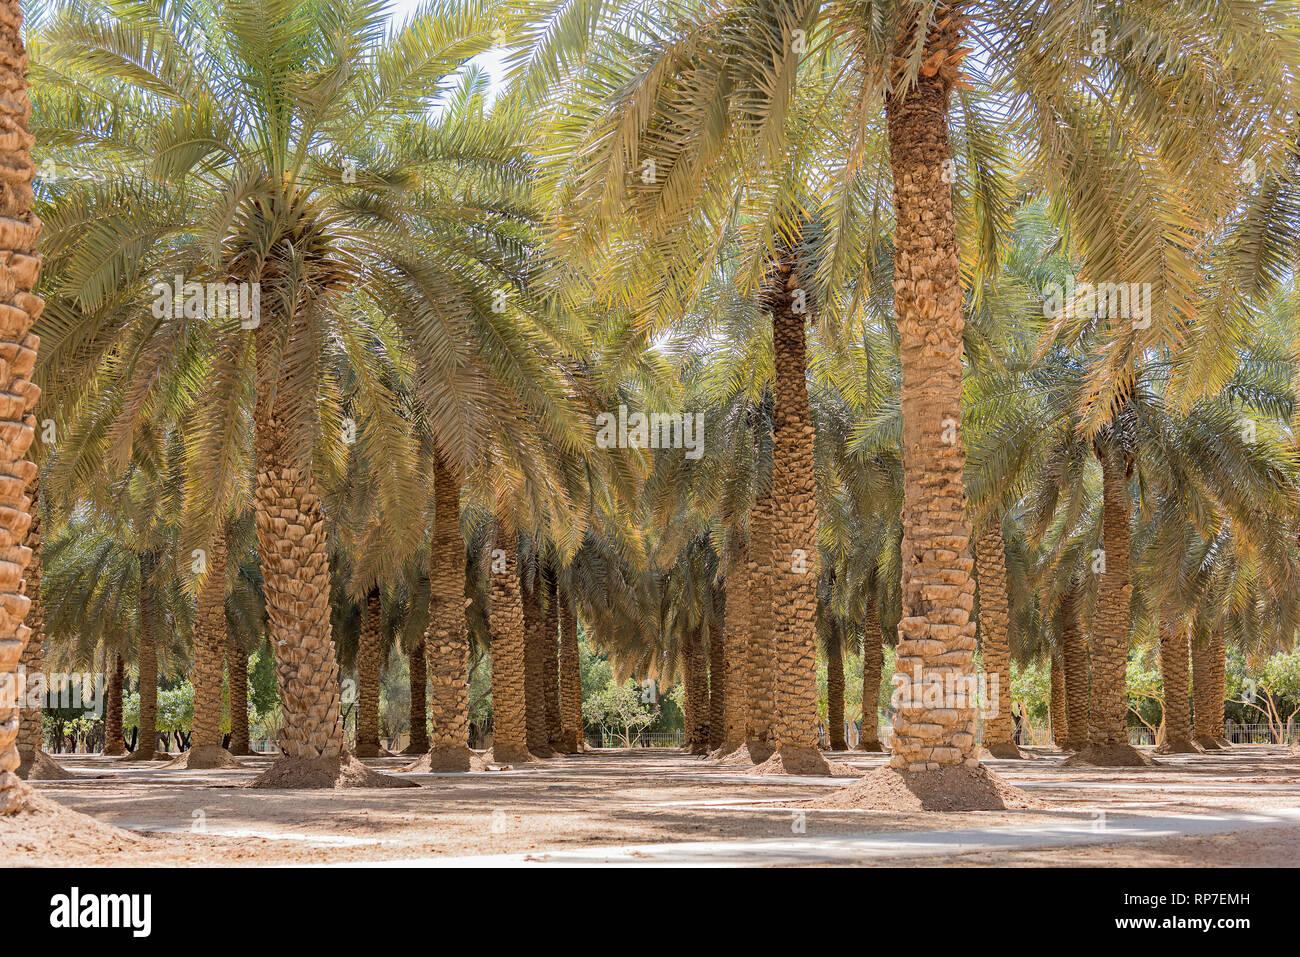 Palm tree Park à Riyadh, Arabie Saoudite Photo Stock